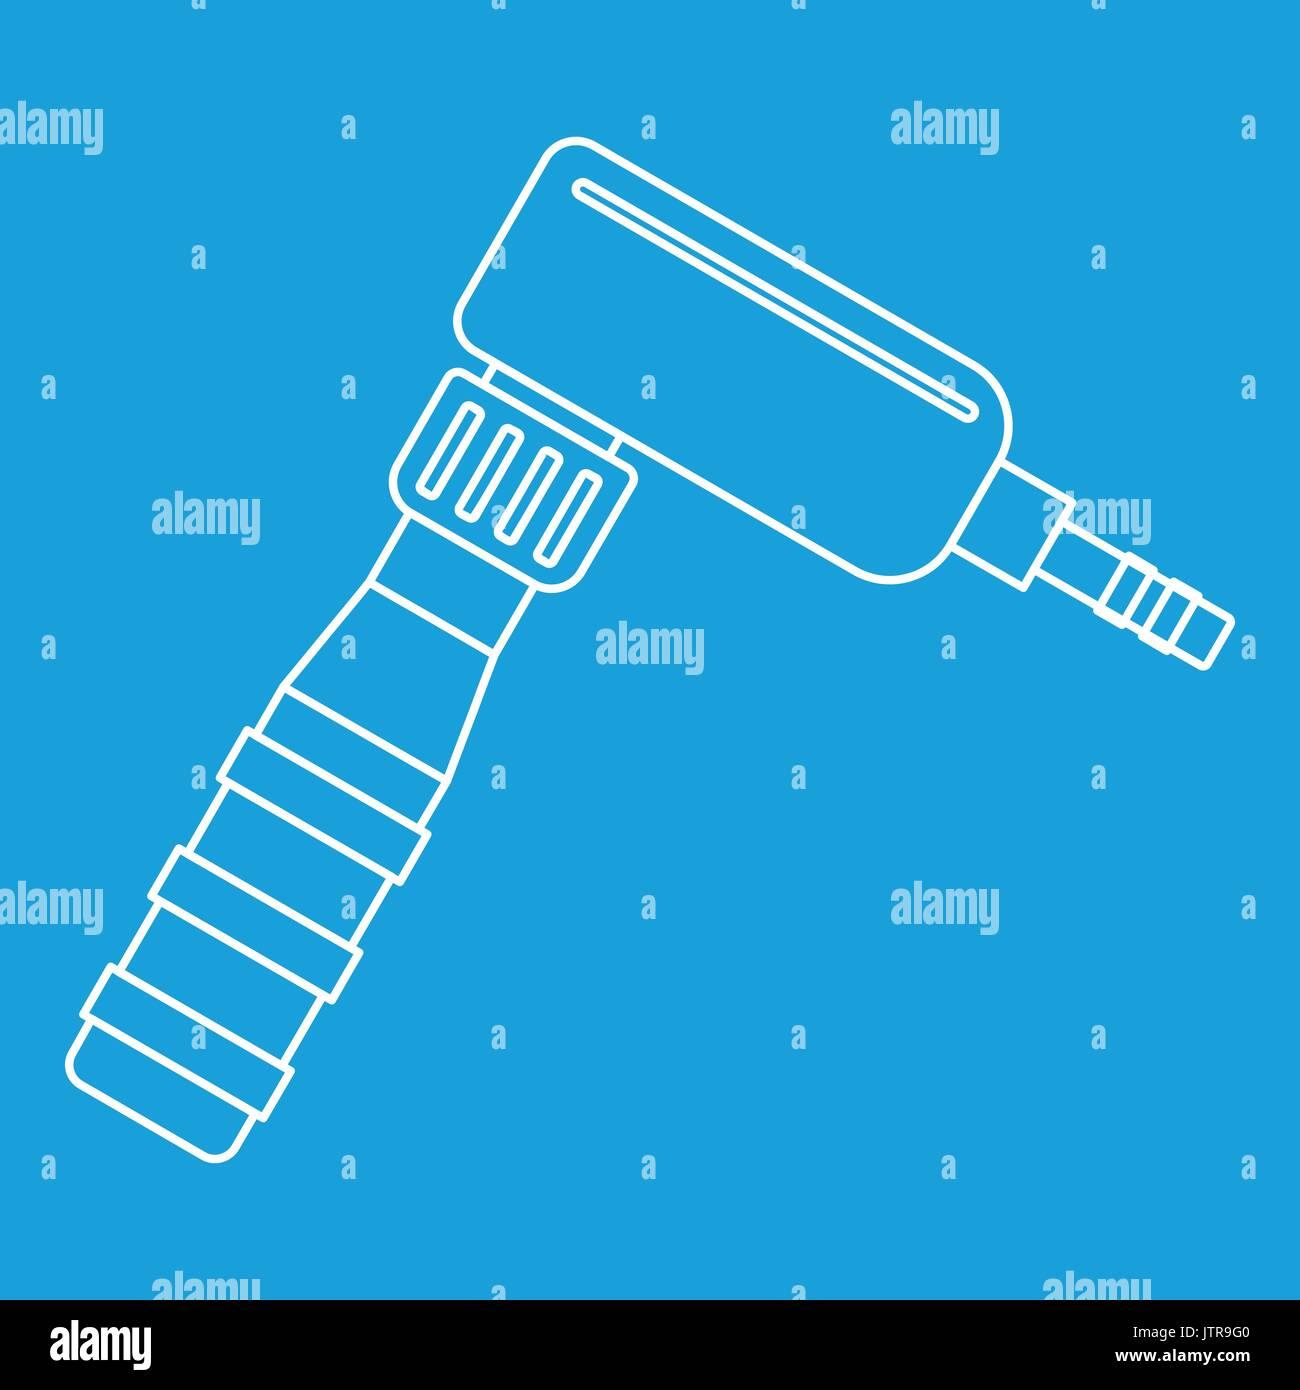 Rotary Tattoo Machine Stock Photos Diagram Hand Draw Icon Outline Image